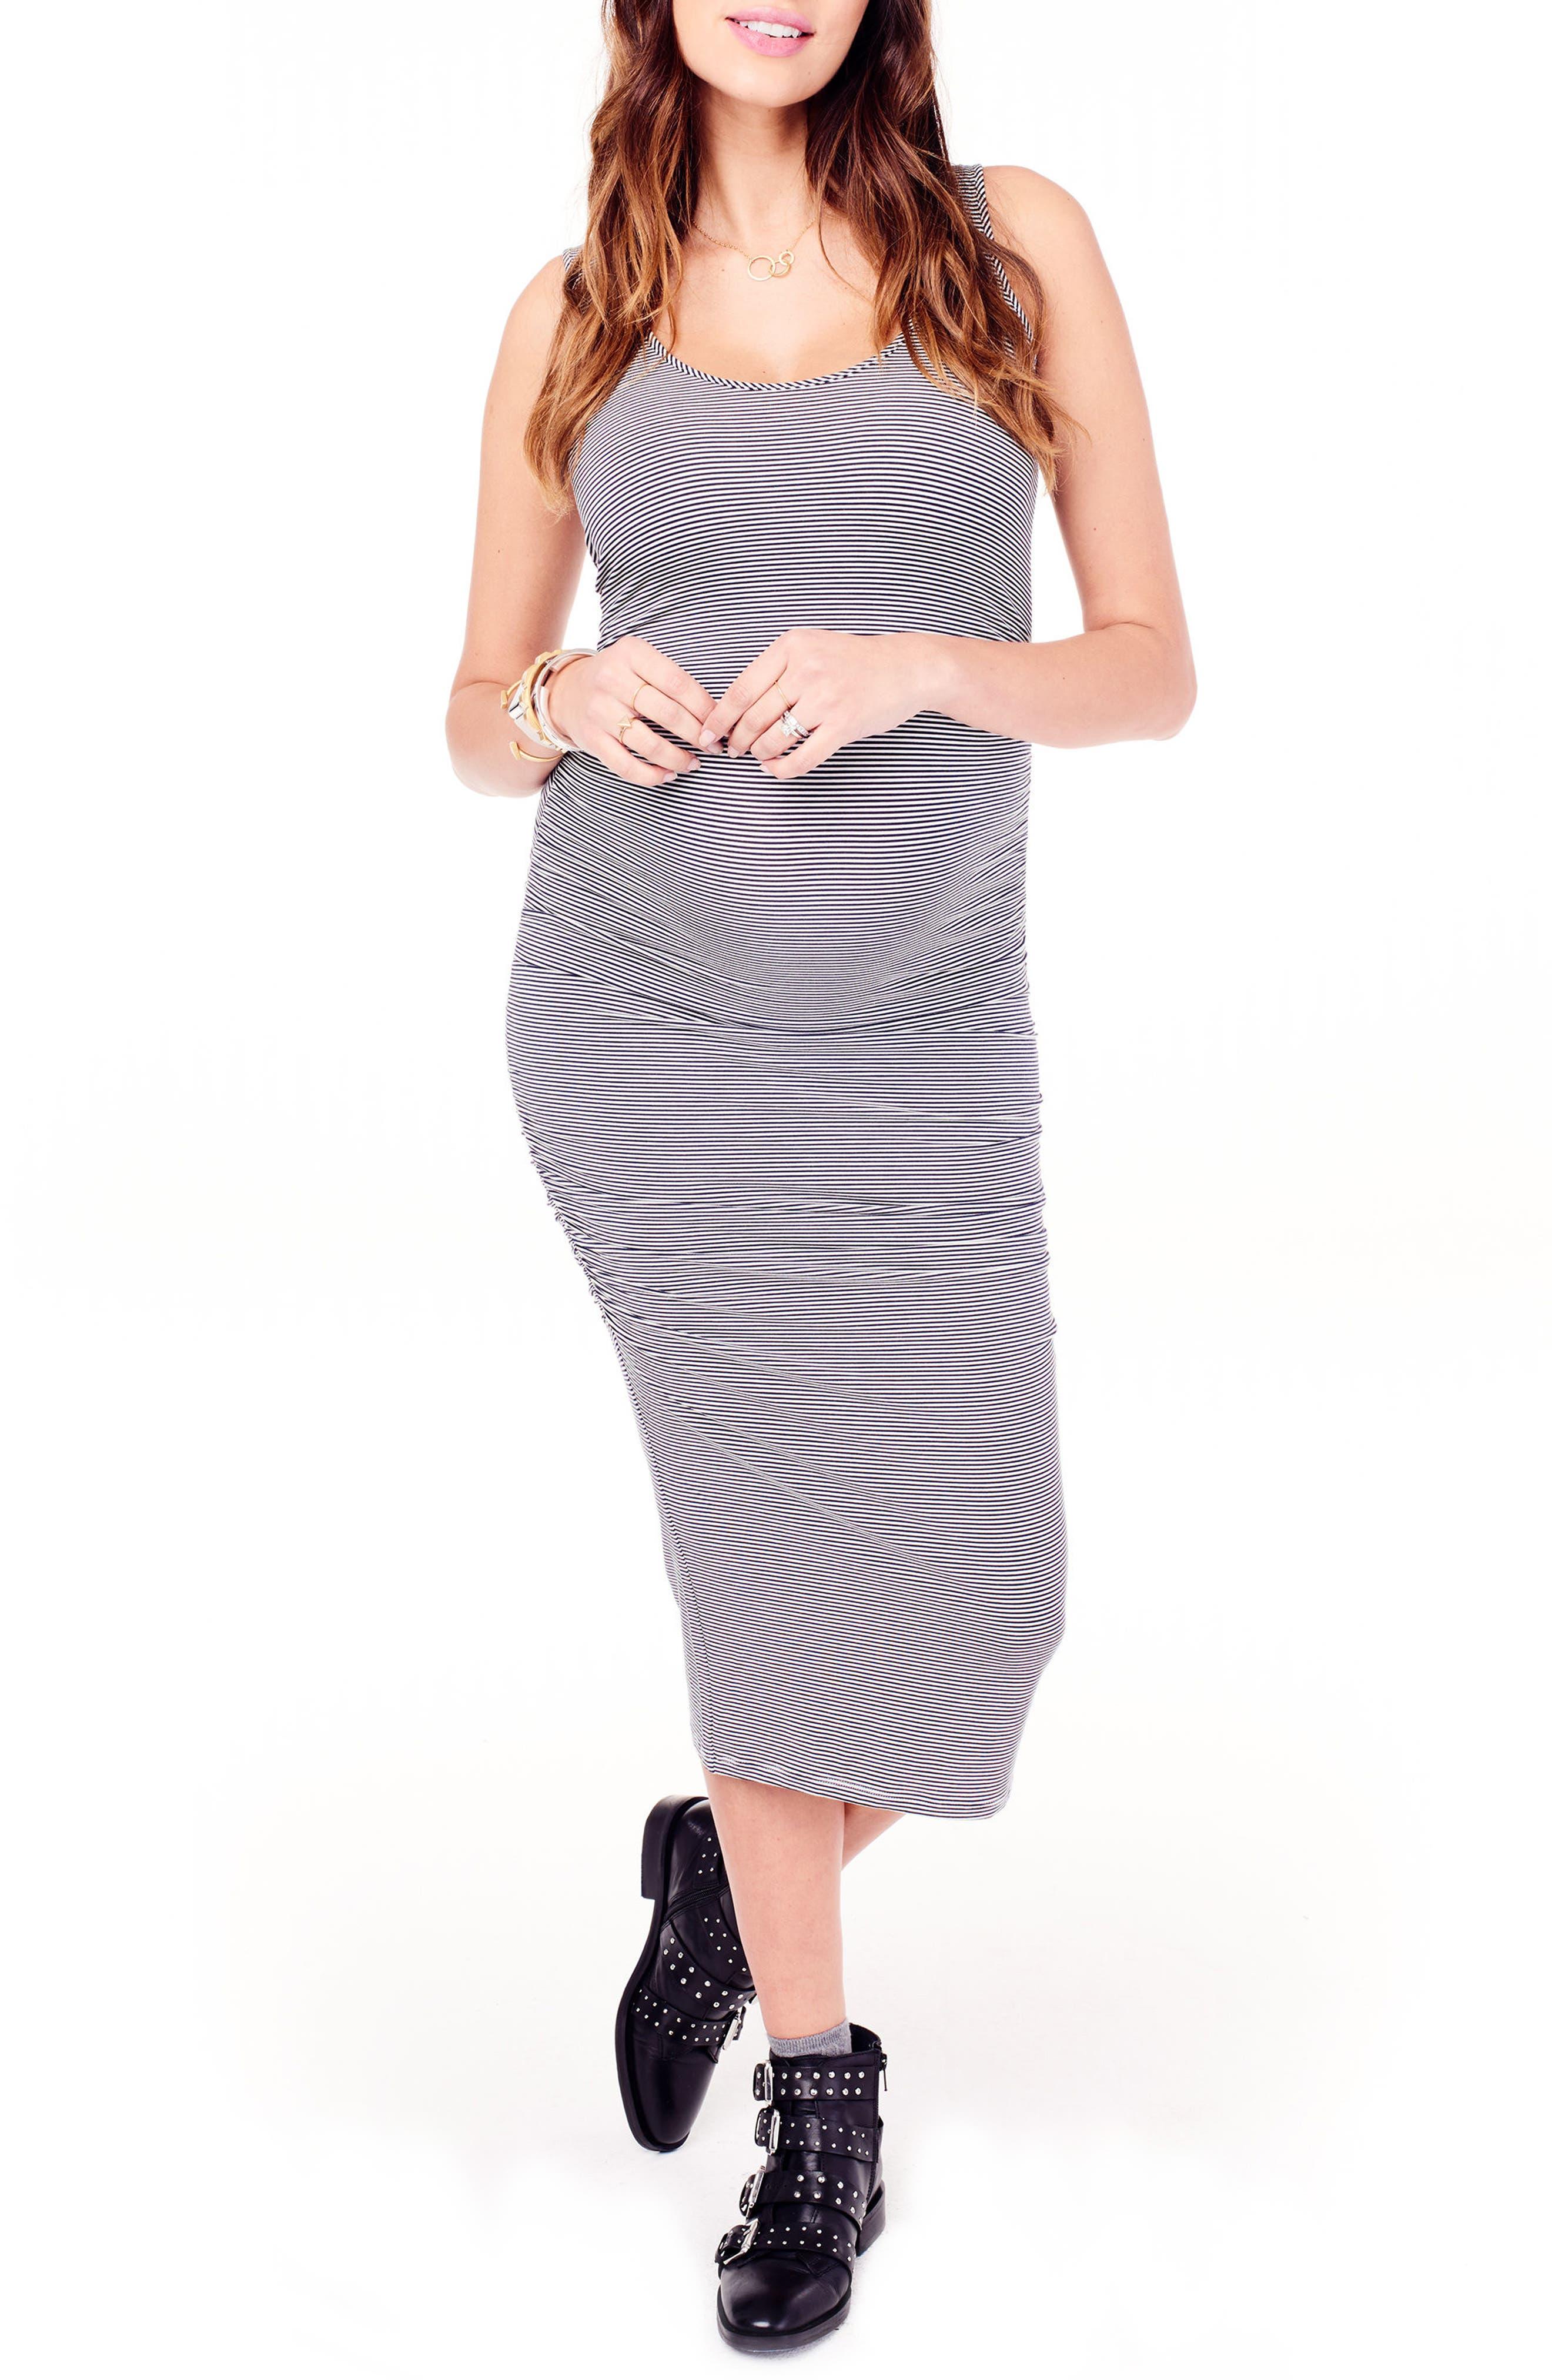 Shirred Midi Maternity Tank Dress,                             Alternate thumbnail 2, color,                             True Navy/ Ivory Microstripe